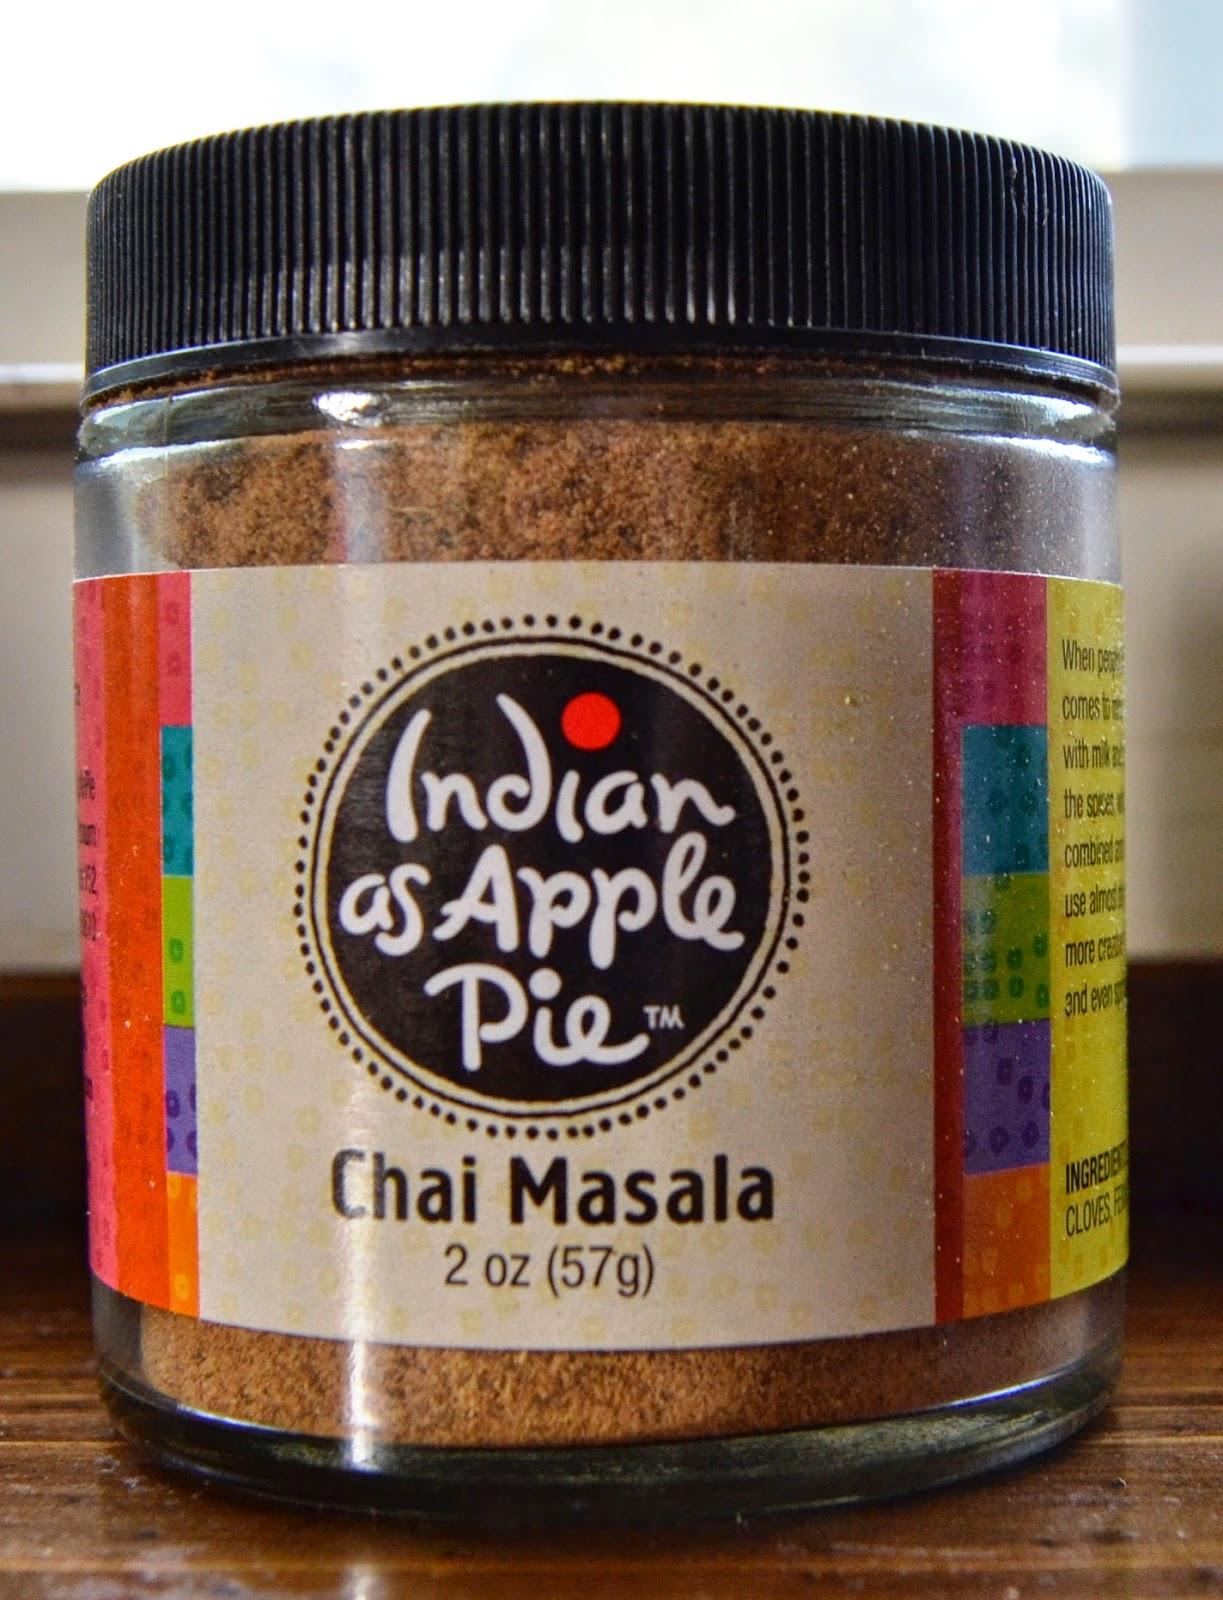 Indian as Apple Pie Chai Masala